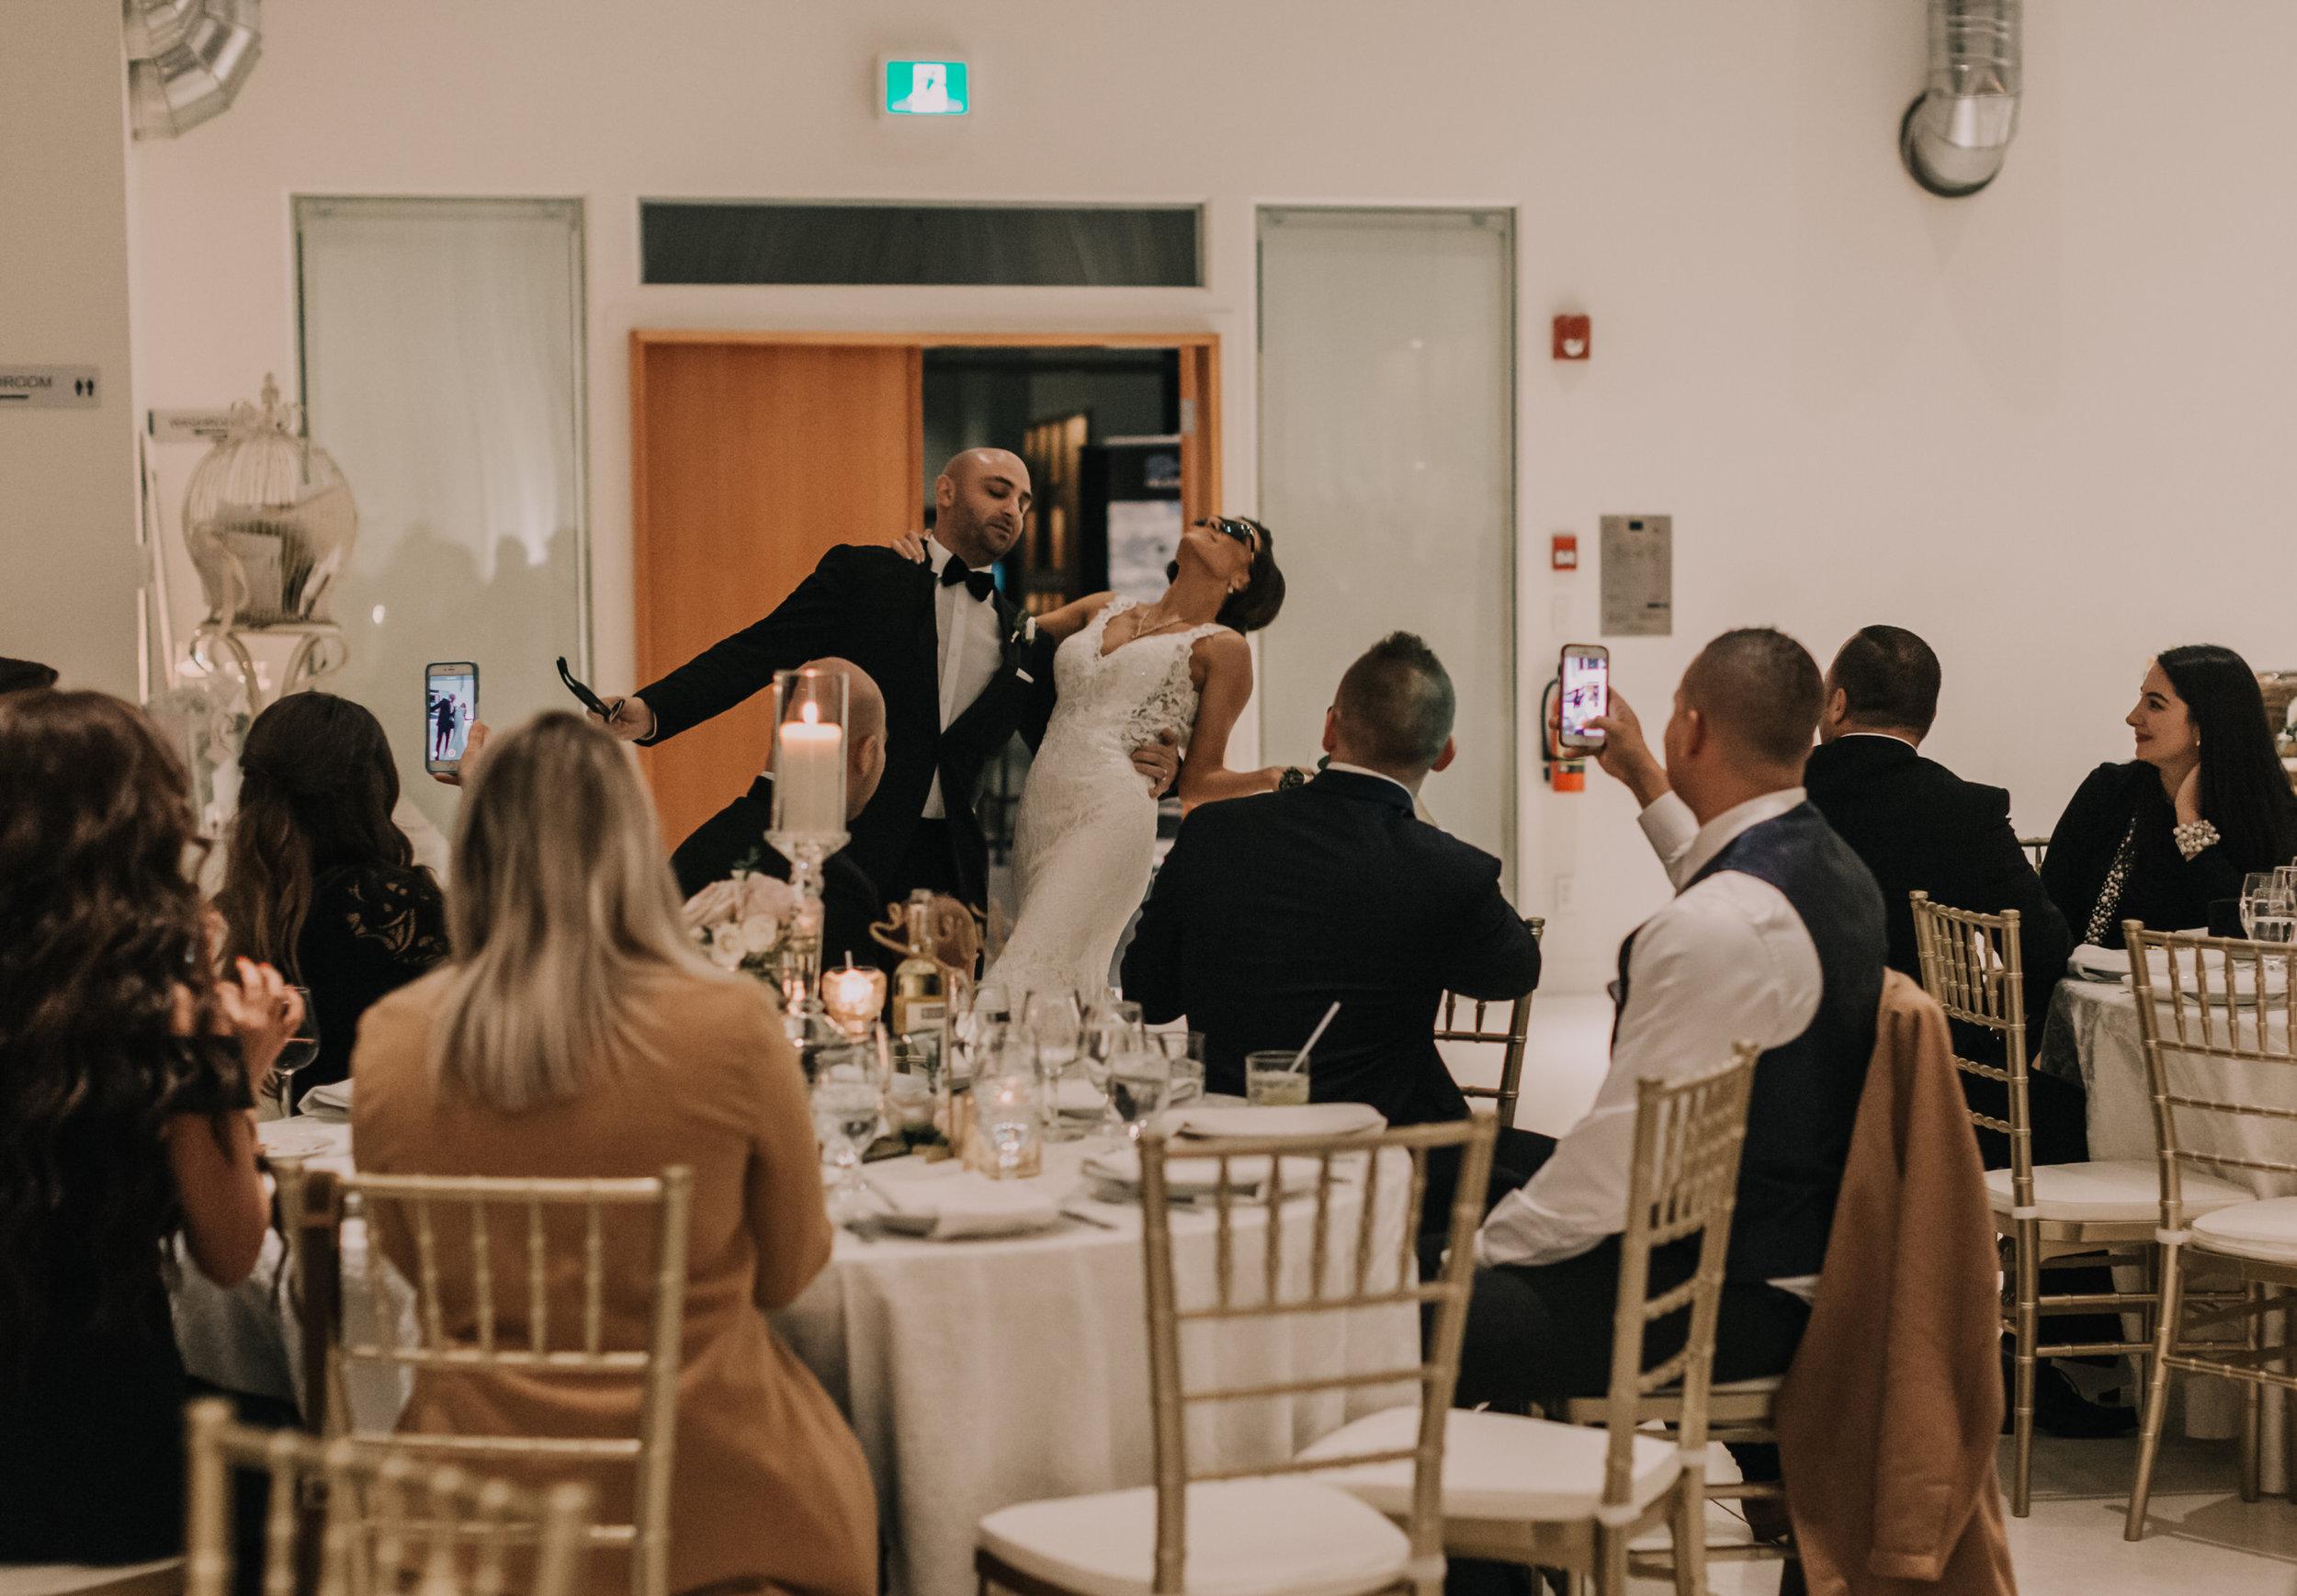 Pitt Meadows Wedding Photographer - Sky Hangar Wedding Photos - Vancouver Wedding Photographer & Videographer - Sunshine Coast Wedding Photos - Sunshine Coast Wedding Photographer - Jennifer Picard Photography - IMG_6021.jpg